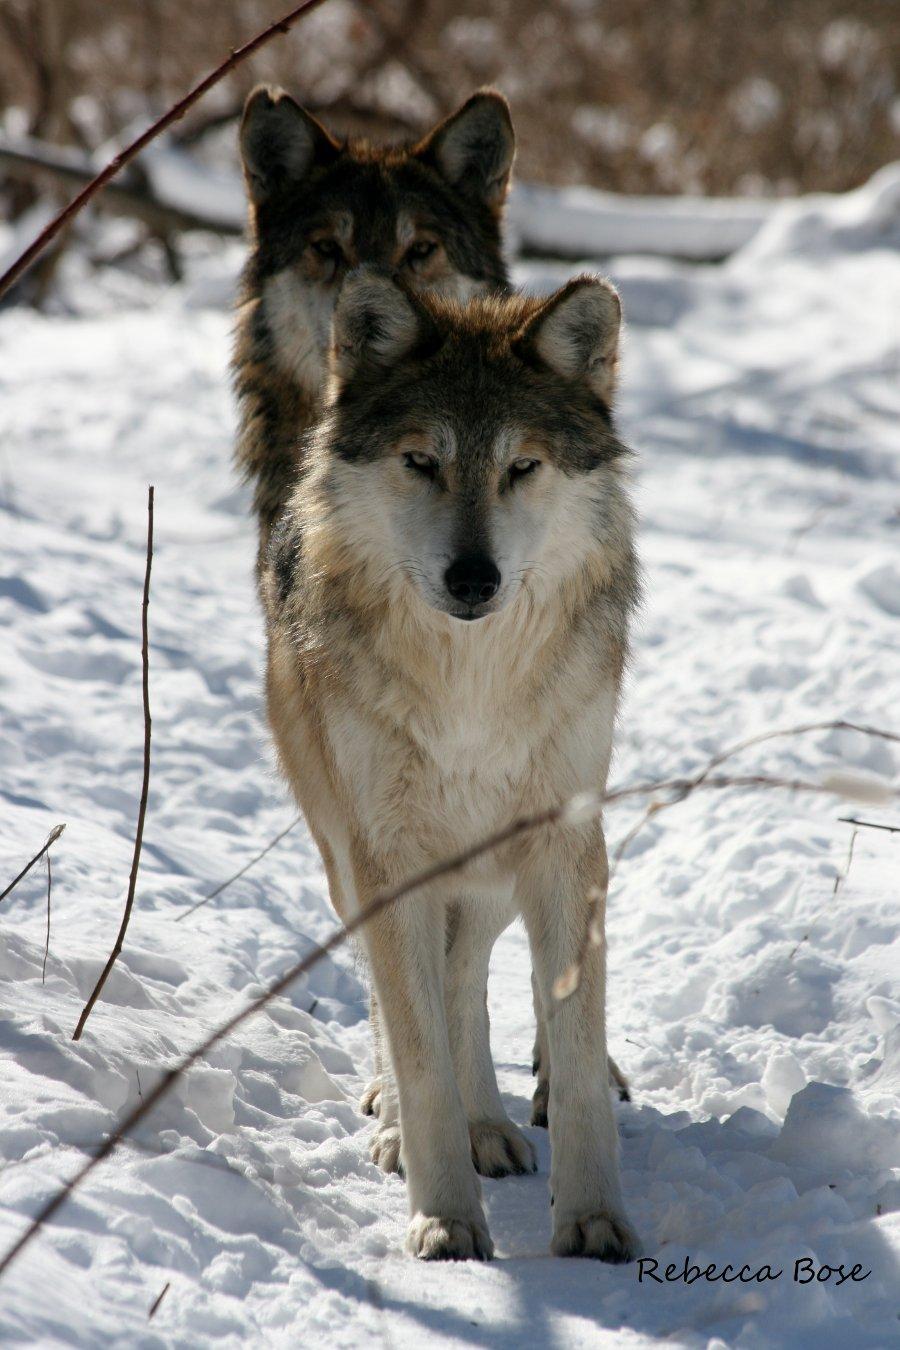 essay extinction of animals